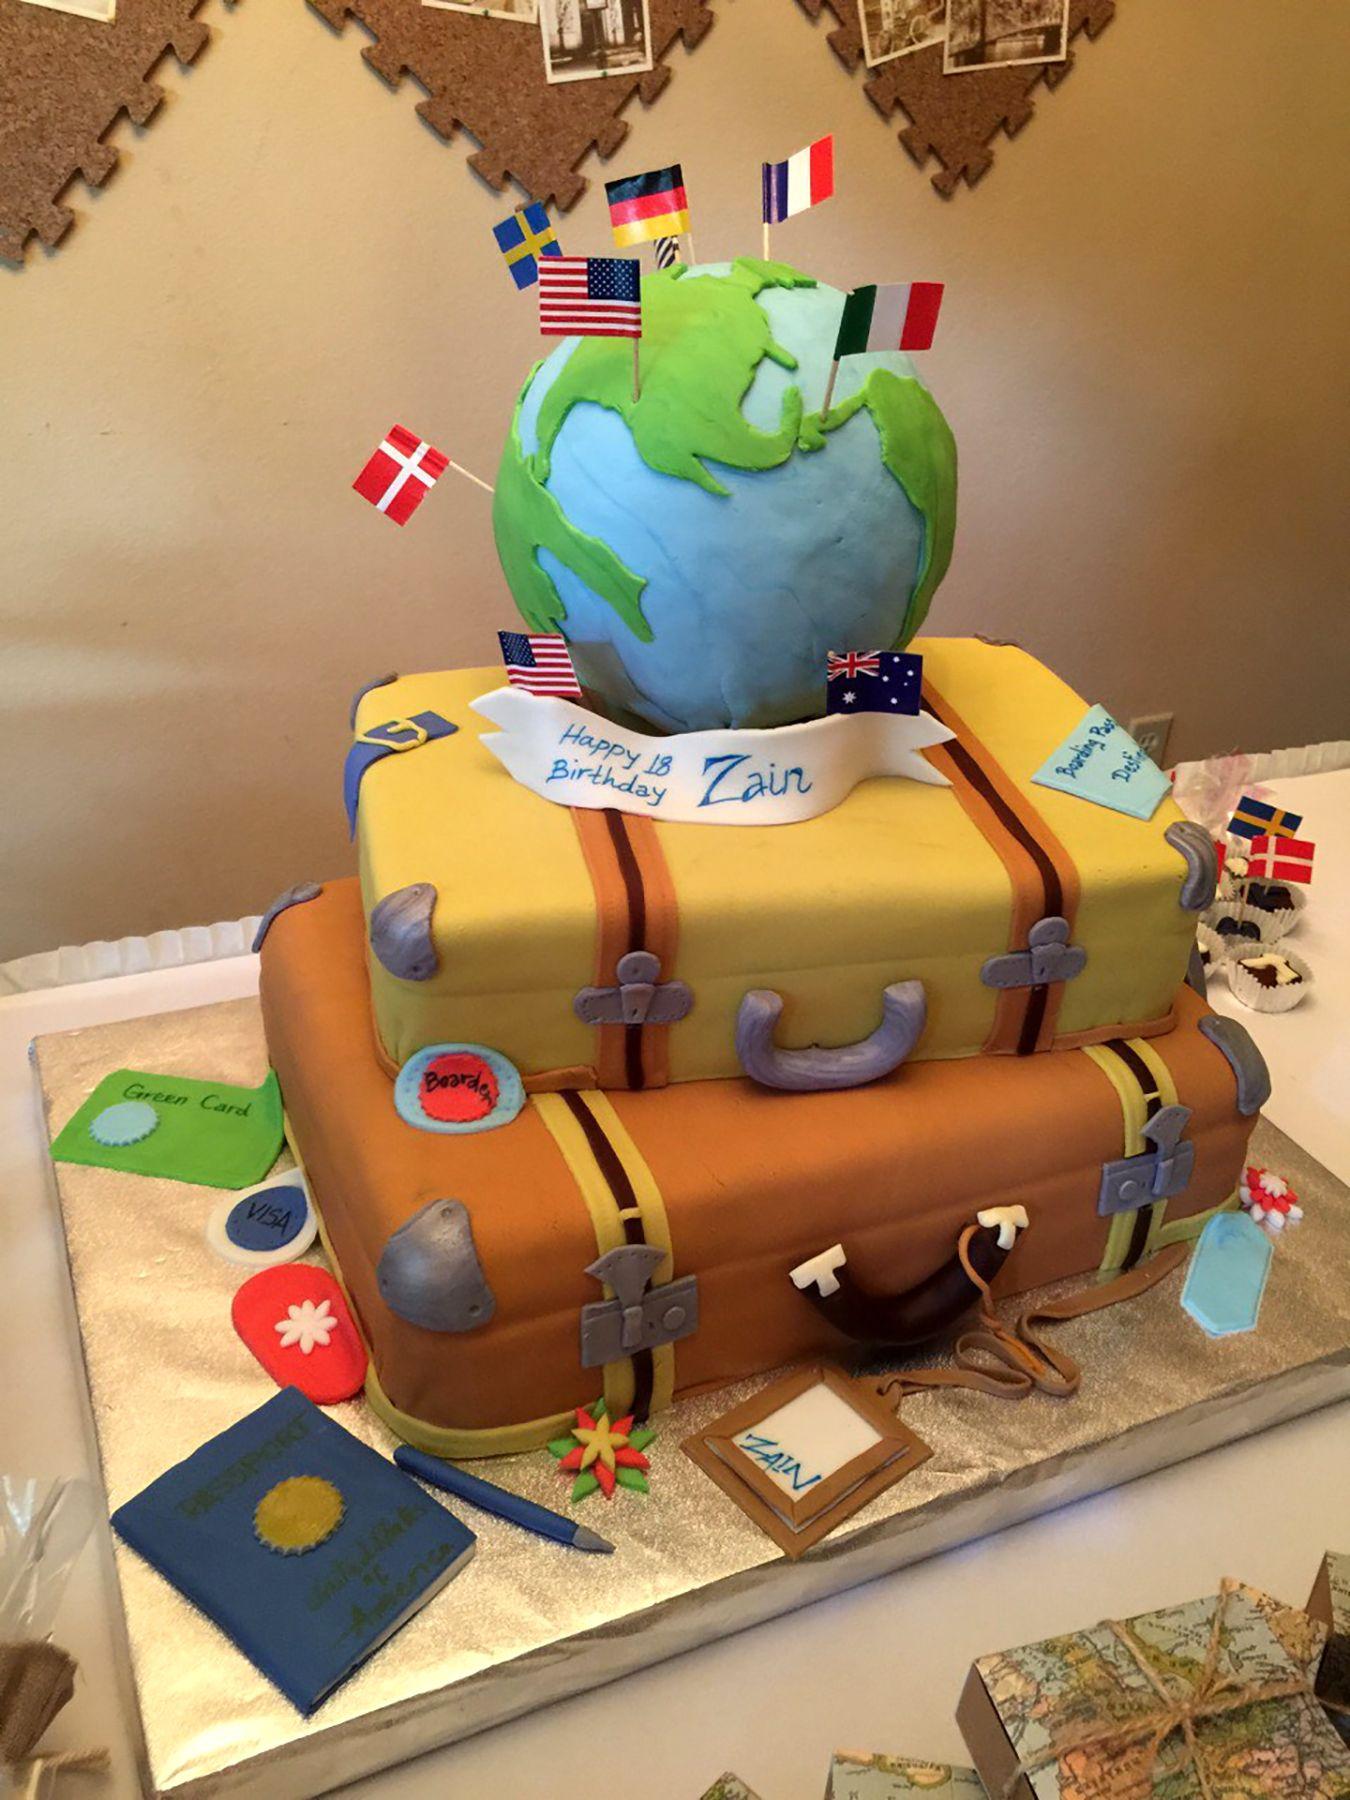 Fondant cake Around the World Travel Theme Cake for Zains 18th